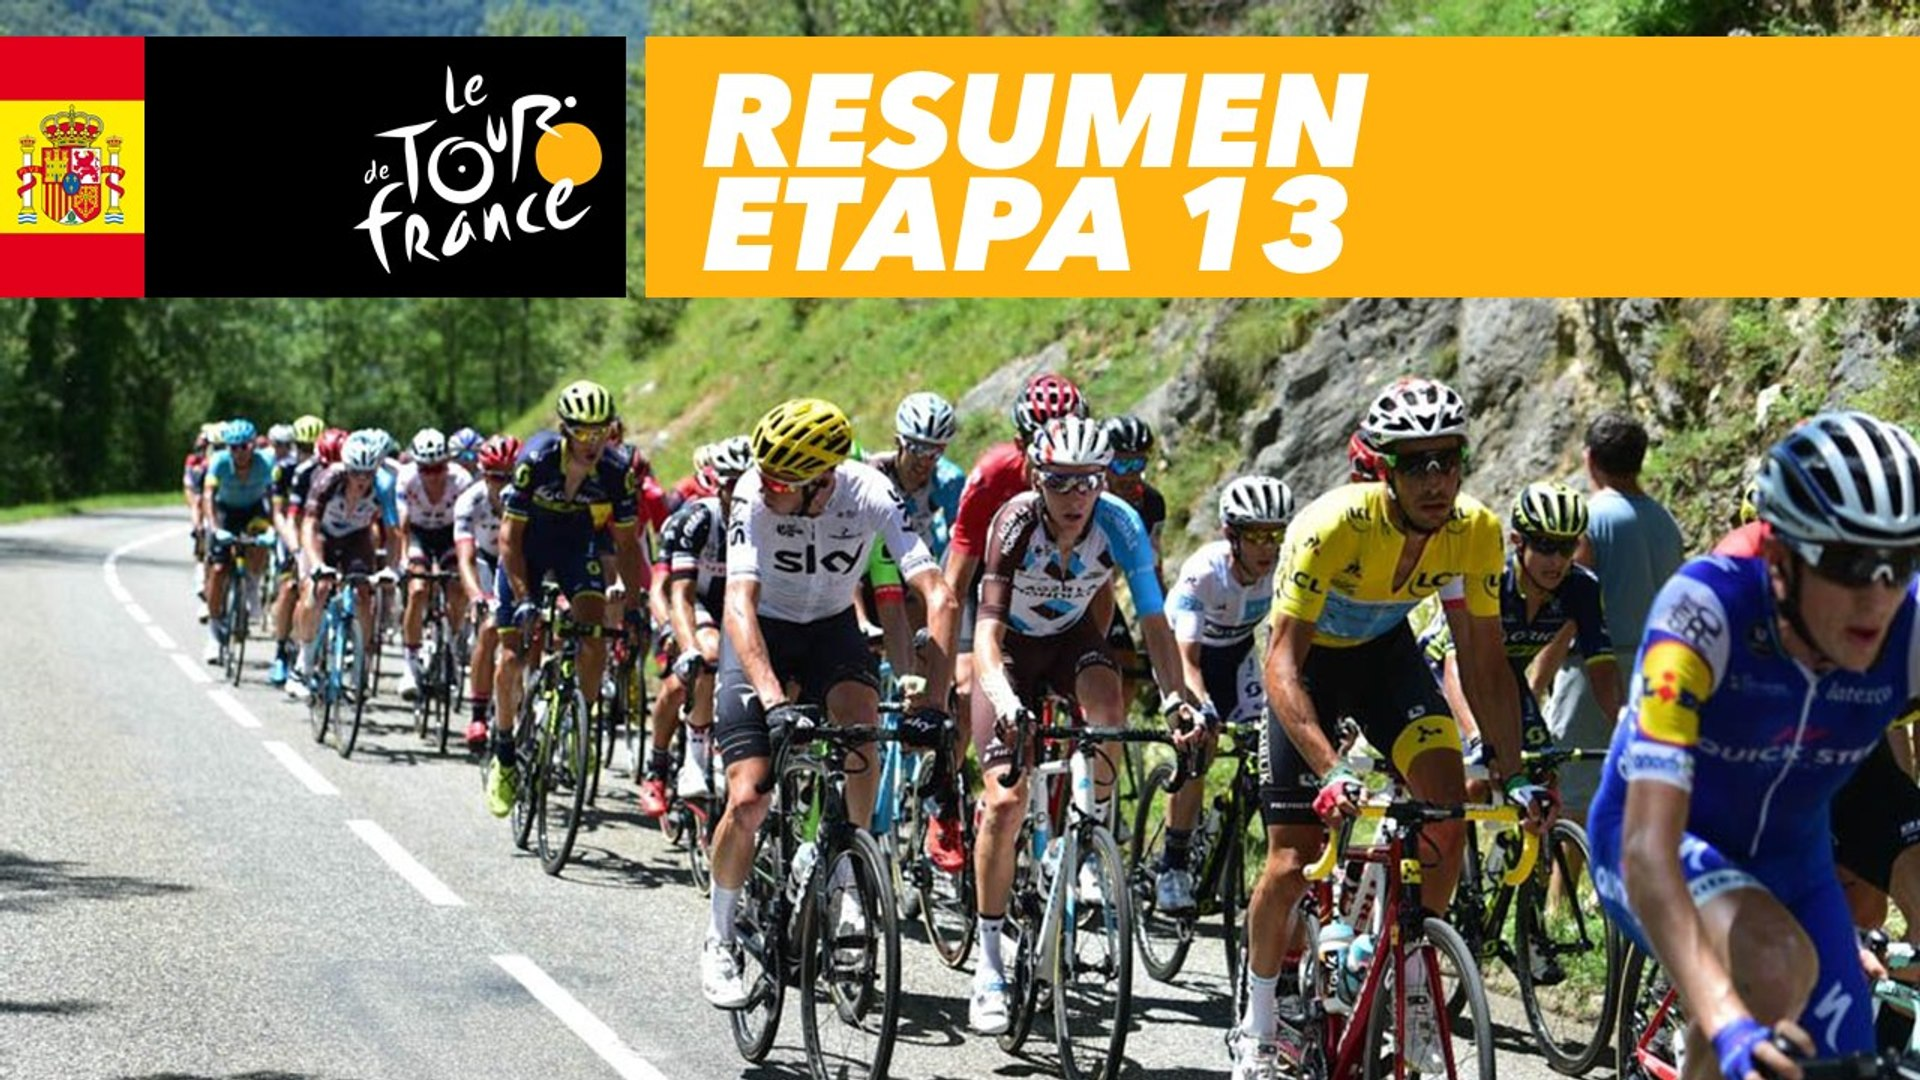 Resumen Etapa 13 Tour De France 2017 Vidéo Dailymotion